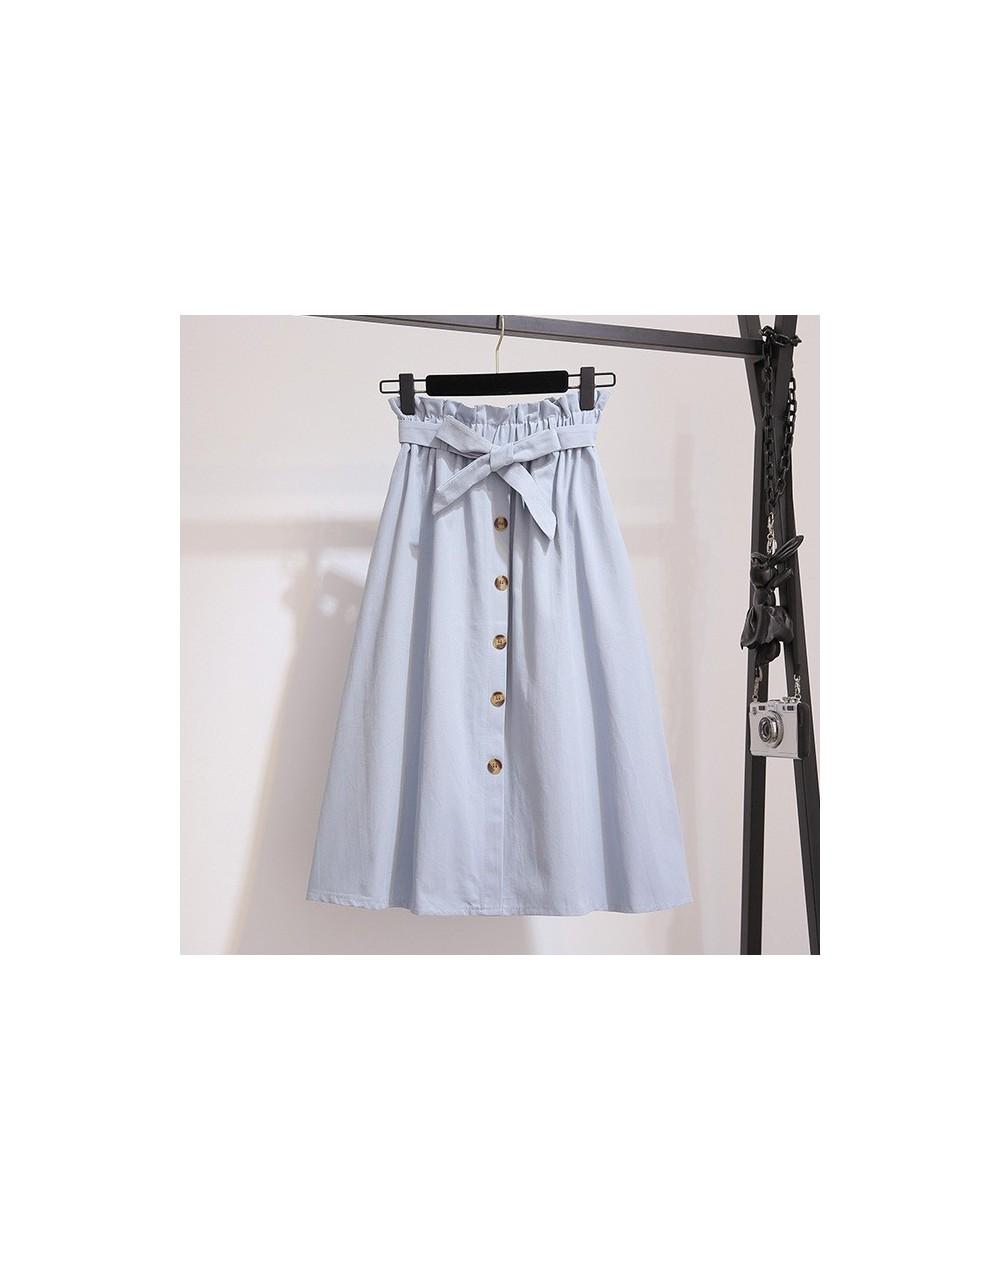 Women Skirts Fashion 2019 High Waist Skirt Women Spring Summer Midi Skirts Womens Elastic Waist A Line Ladies Skirts With Be...